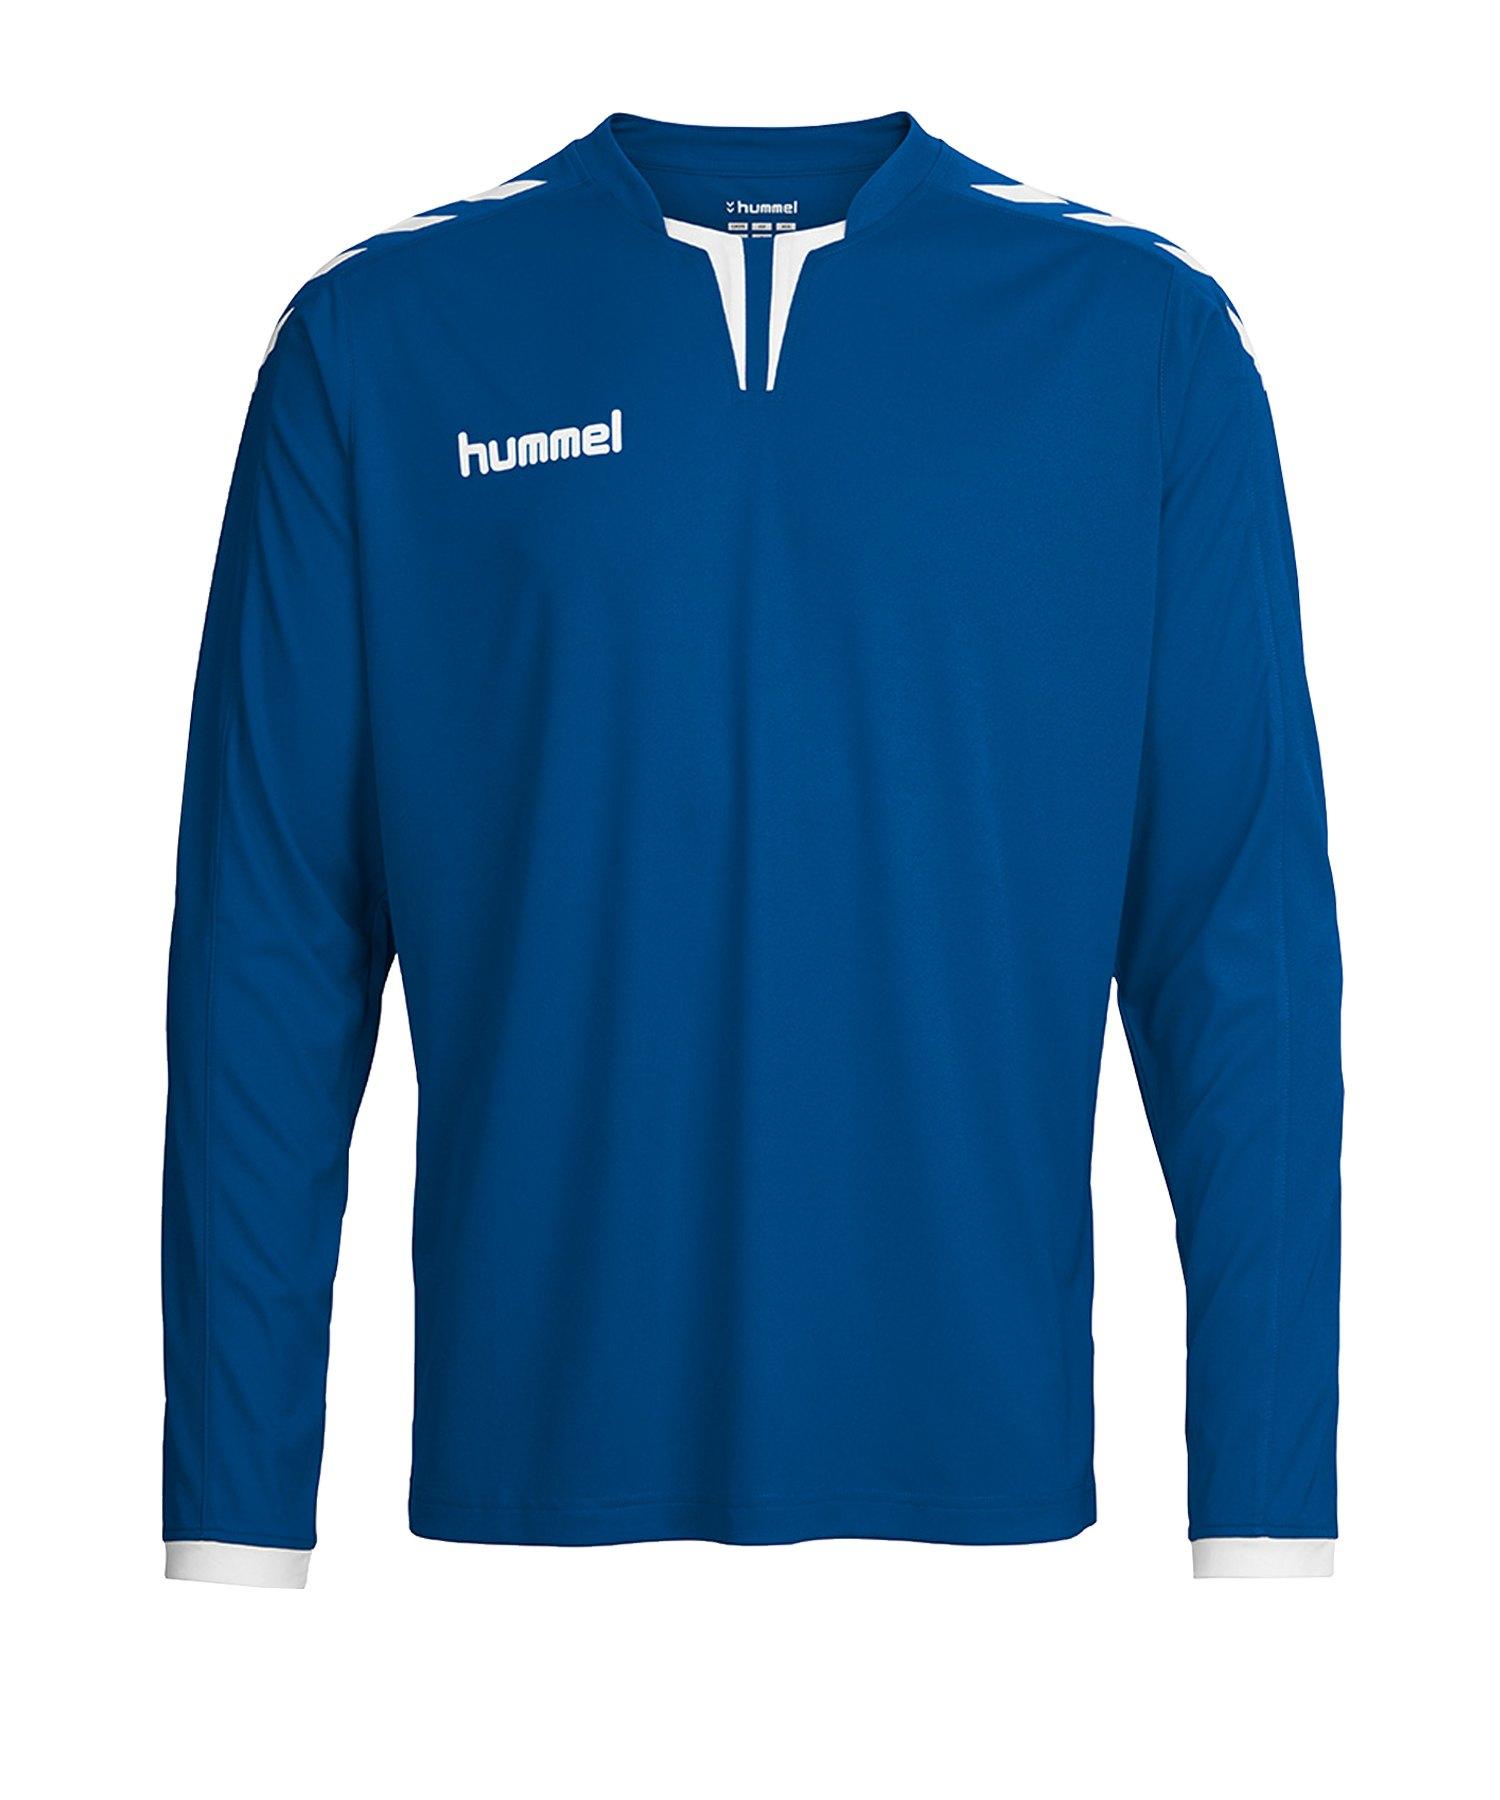 Hummel Core Trikot langarm Blau F7044 - blau